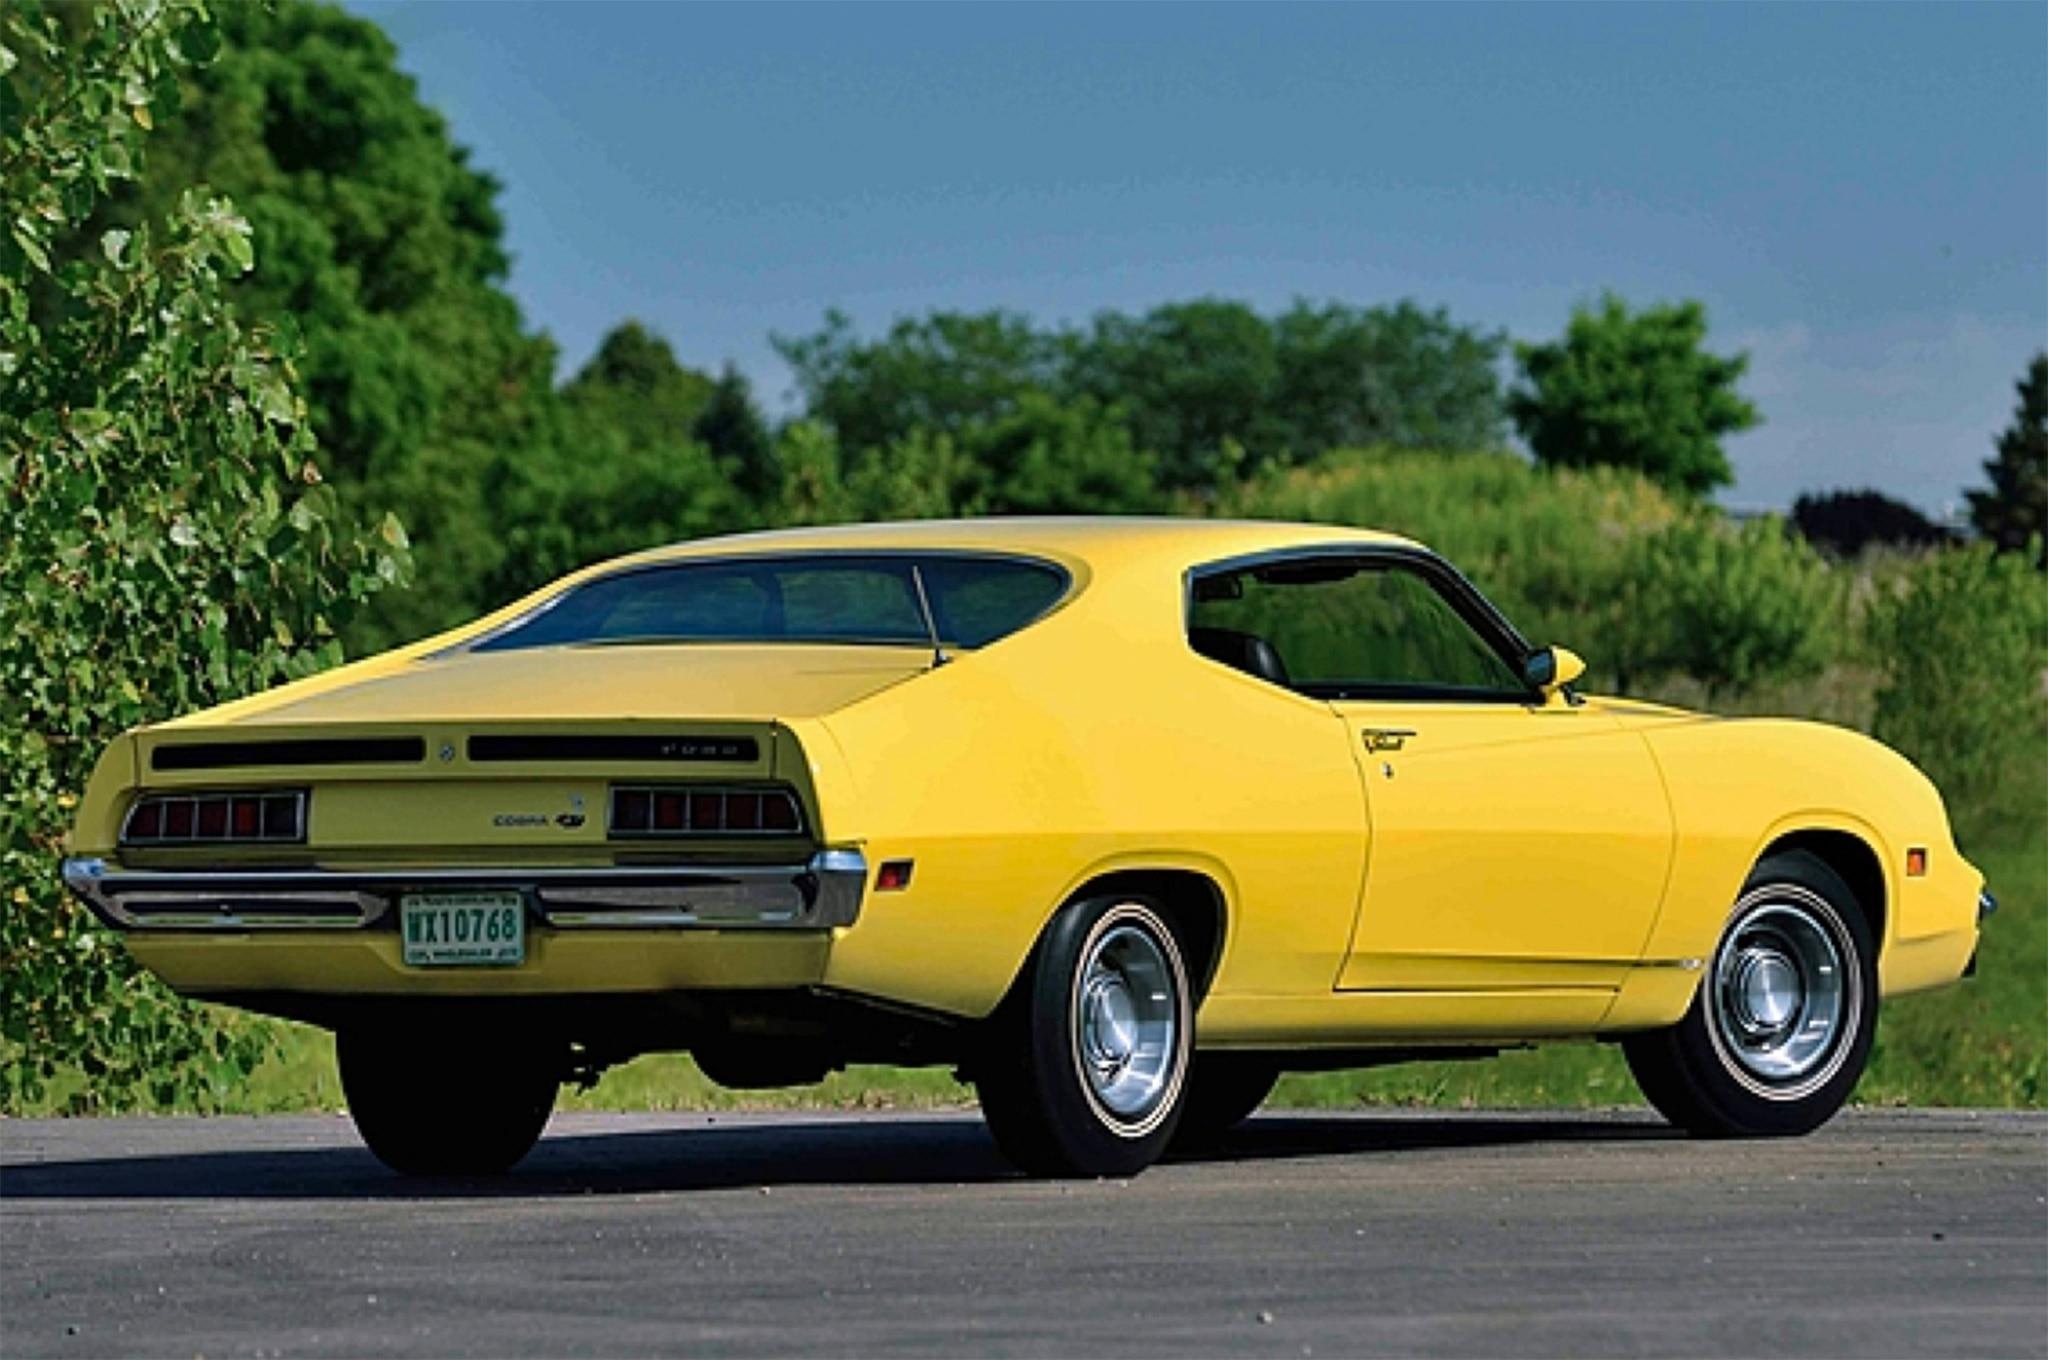 003 1970 Ford Torino King Cobra NASCAR Rear